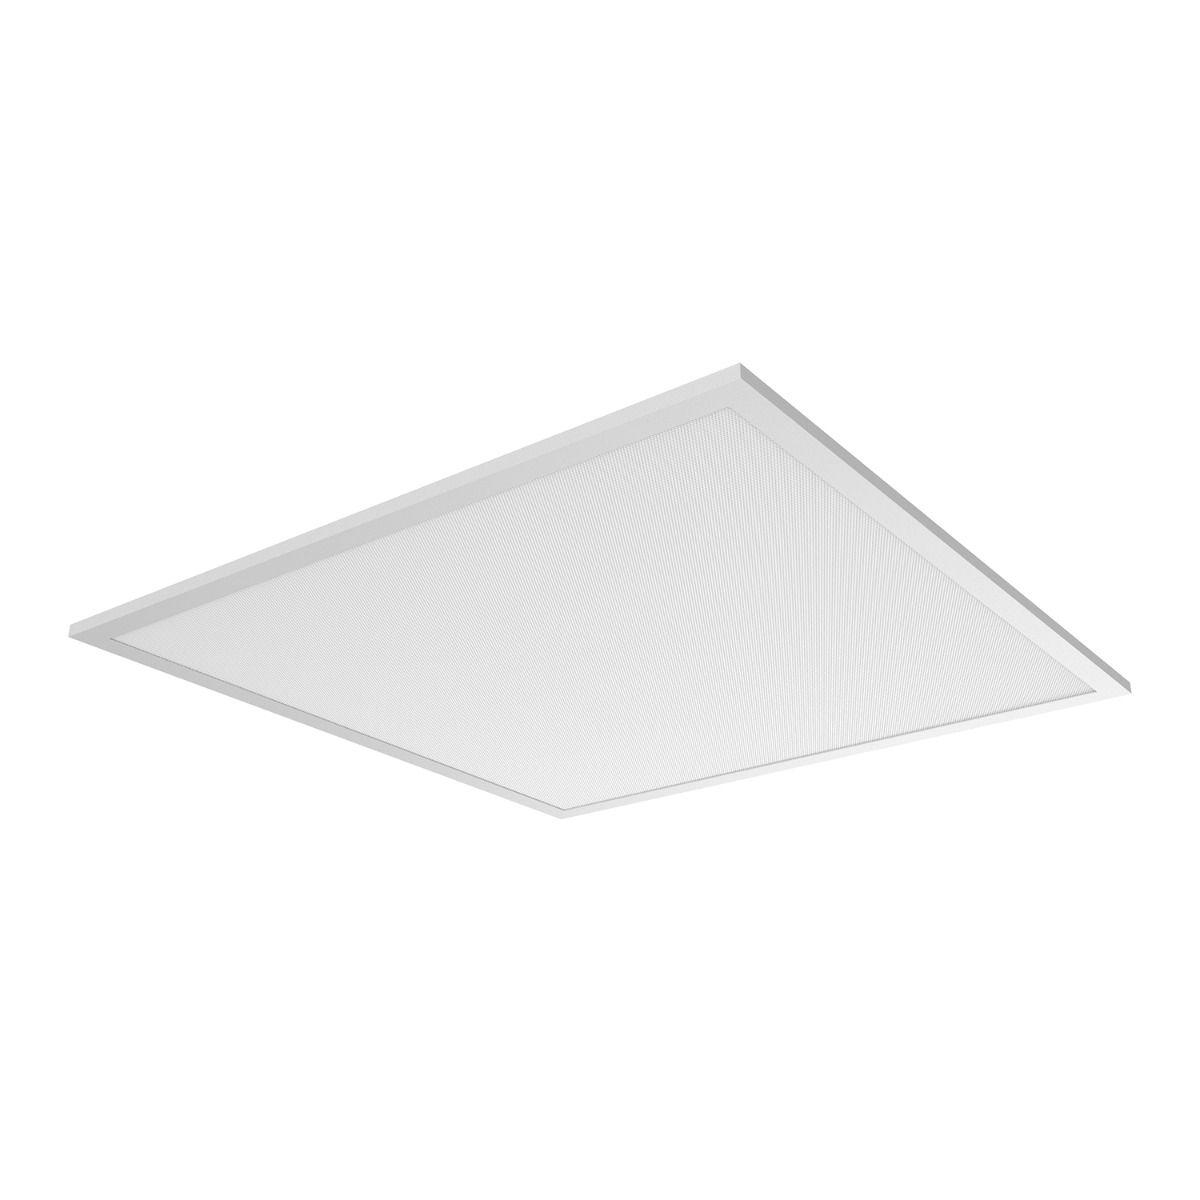 Noxion LED Panel Delta Pro V3 Highlum DALI 36W 4000K 5500lm 60x60cm UGR <19   Kallvit - Ersättare 4x18W